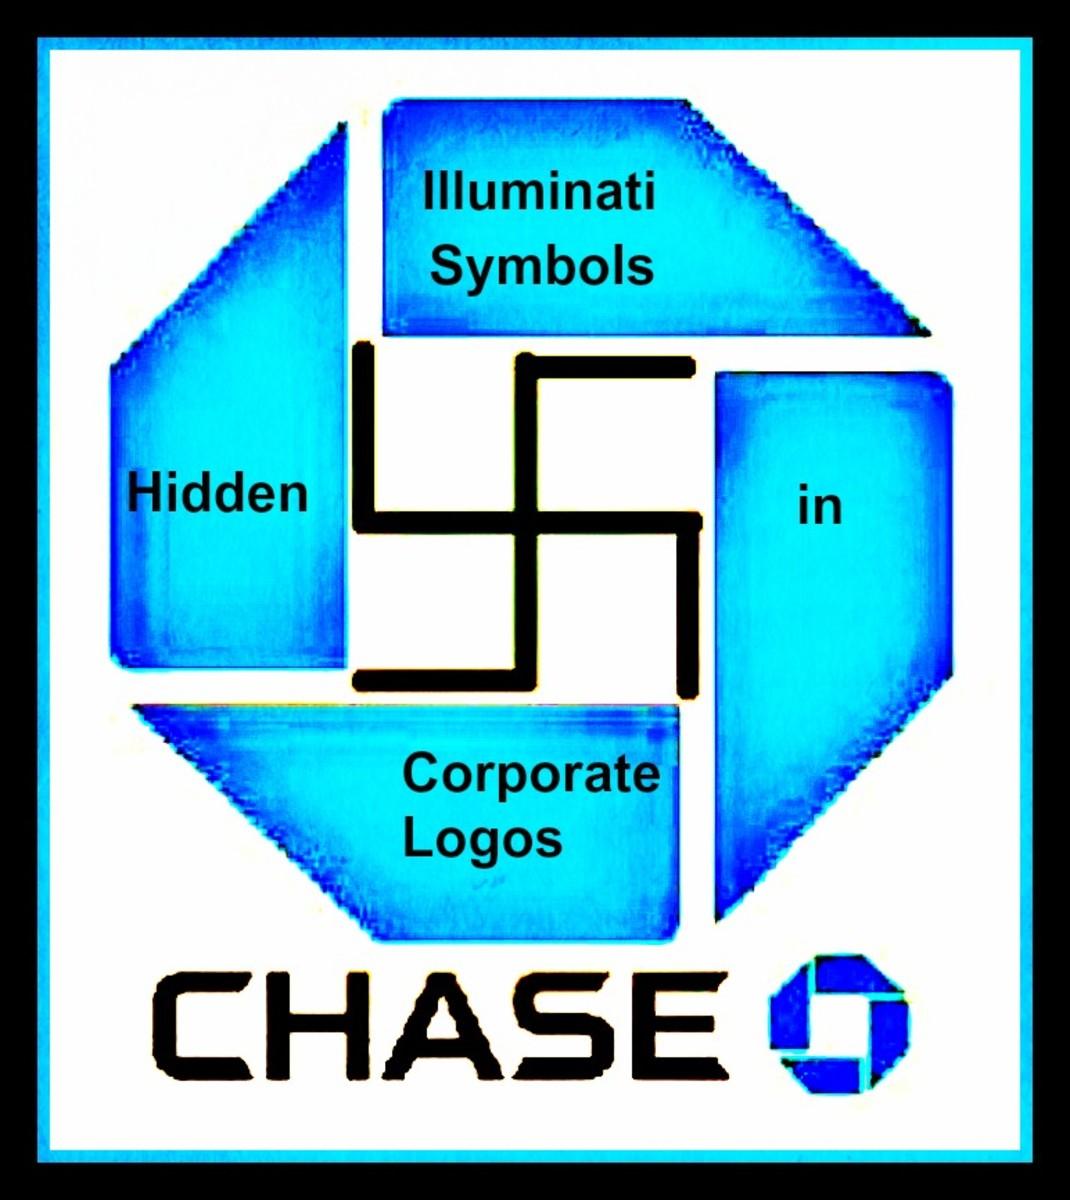 Illuminati Symbols Hidden in Corporate Logos | HubPages